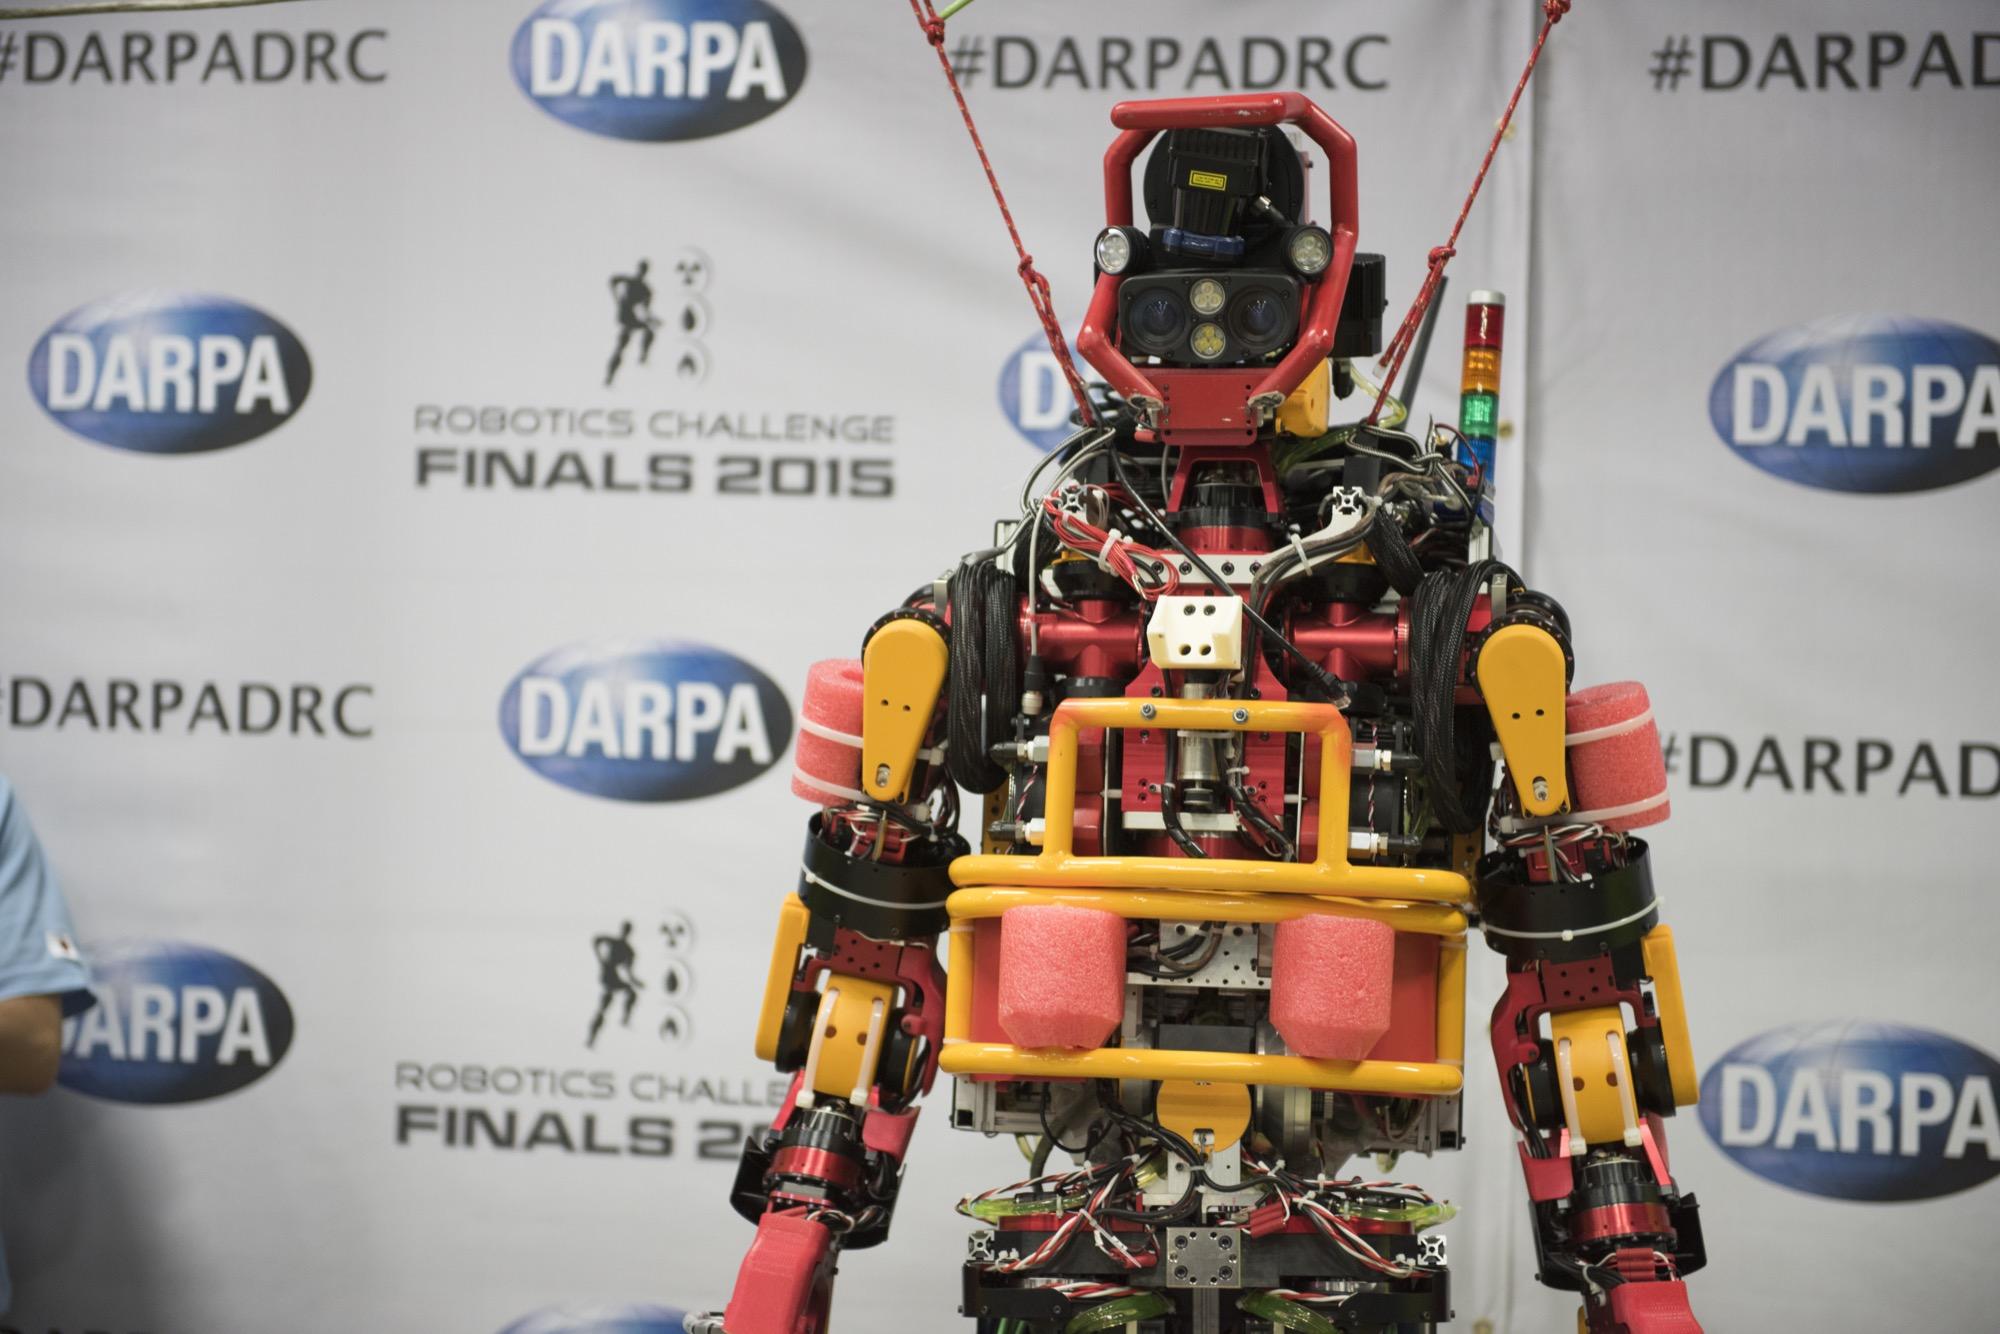 Watch 24 Robots Compete in Weekend DARPA Challenge